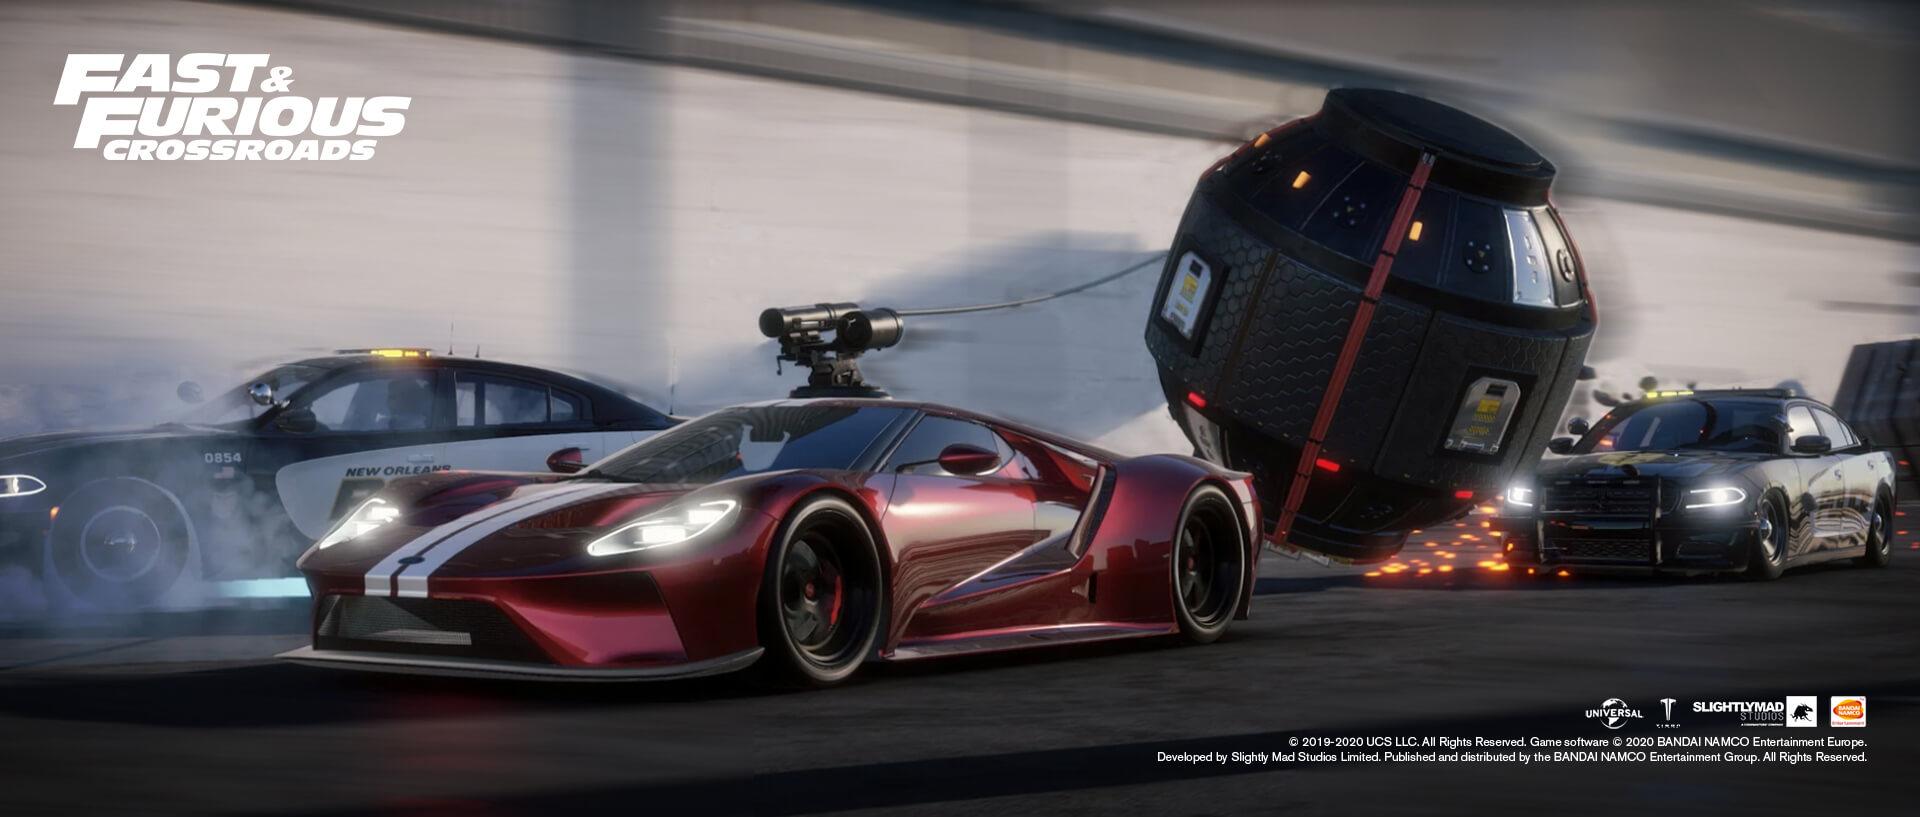 Fast & Furious Crossroads new screenshots 2